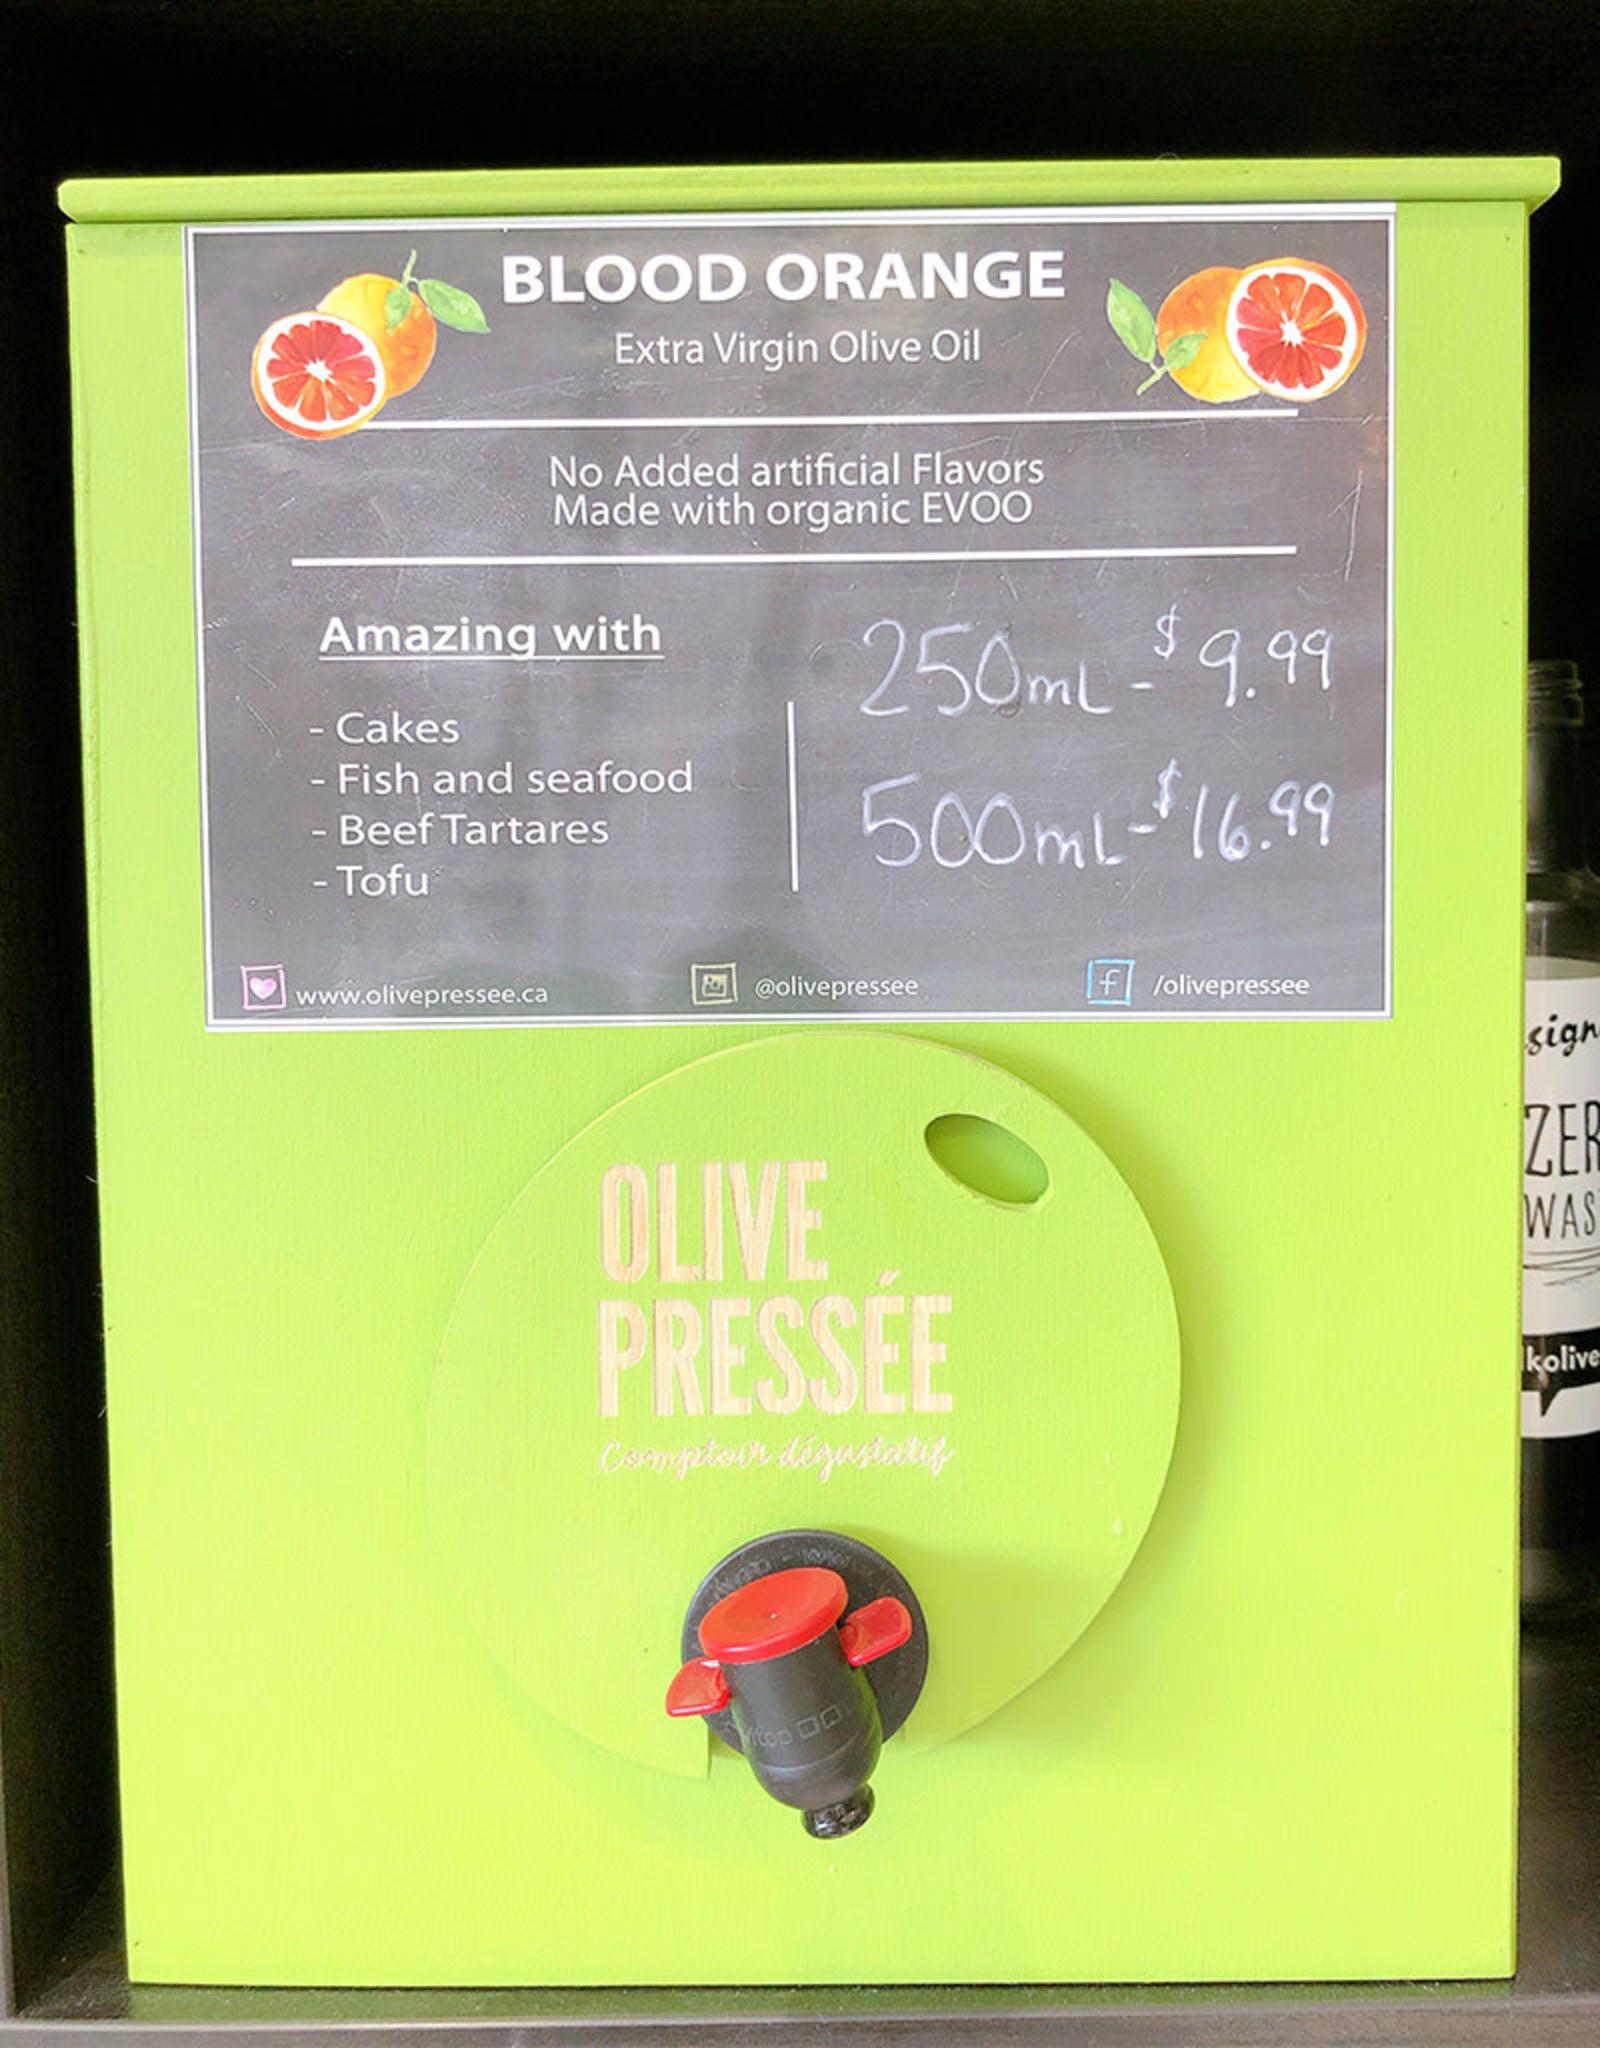 Olive Pressee Olive Pressee - Bloody Orange EVOO, 500ml